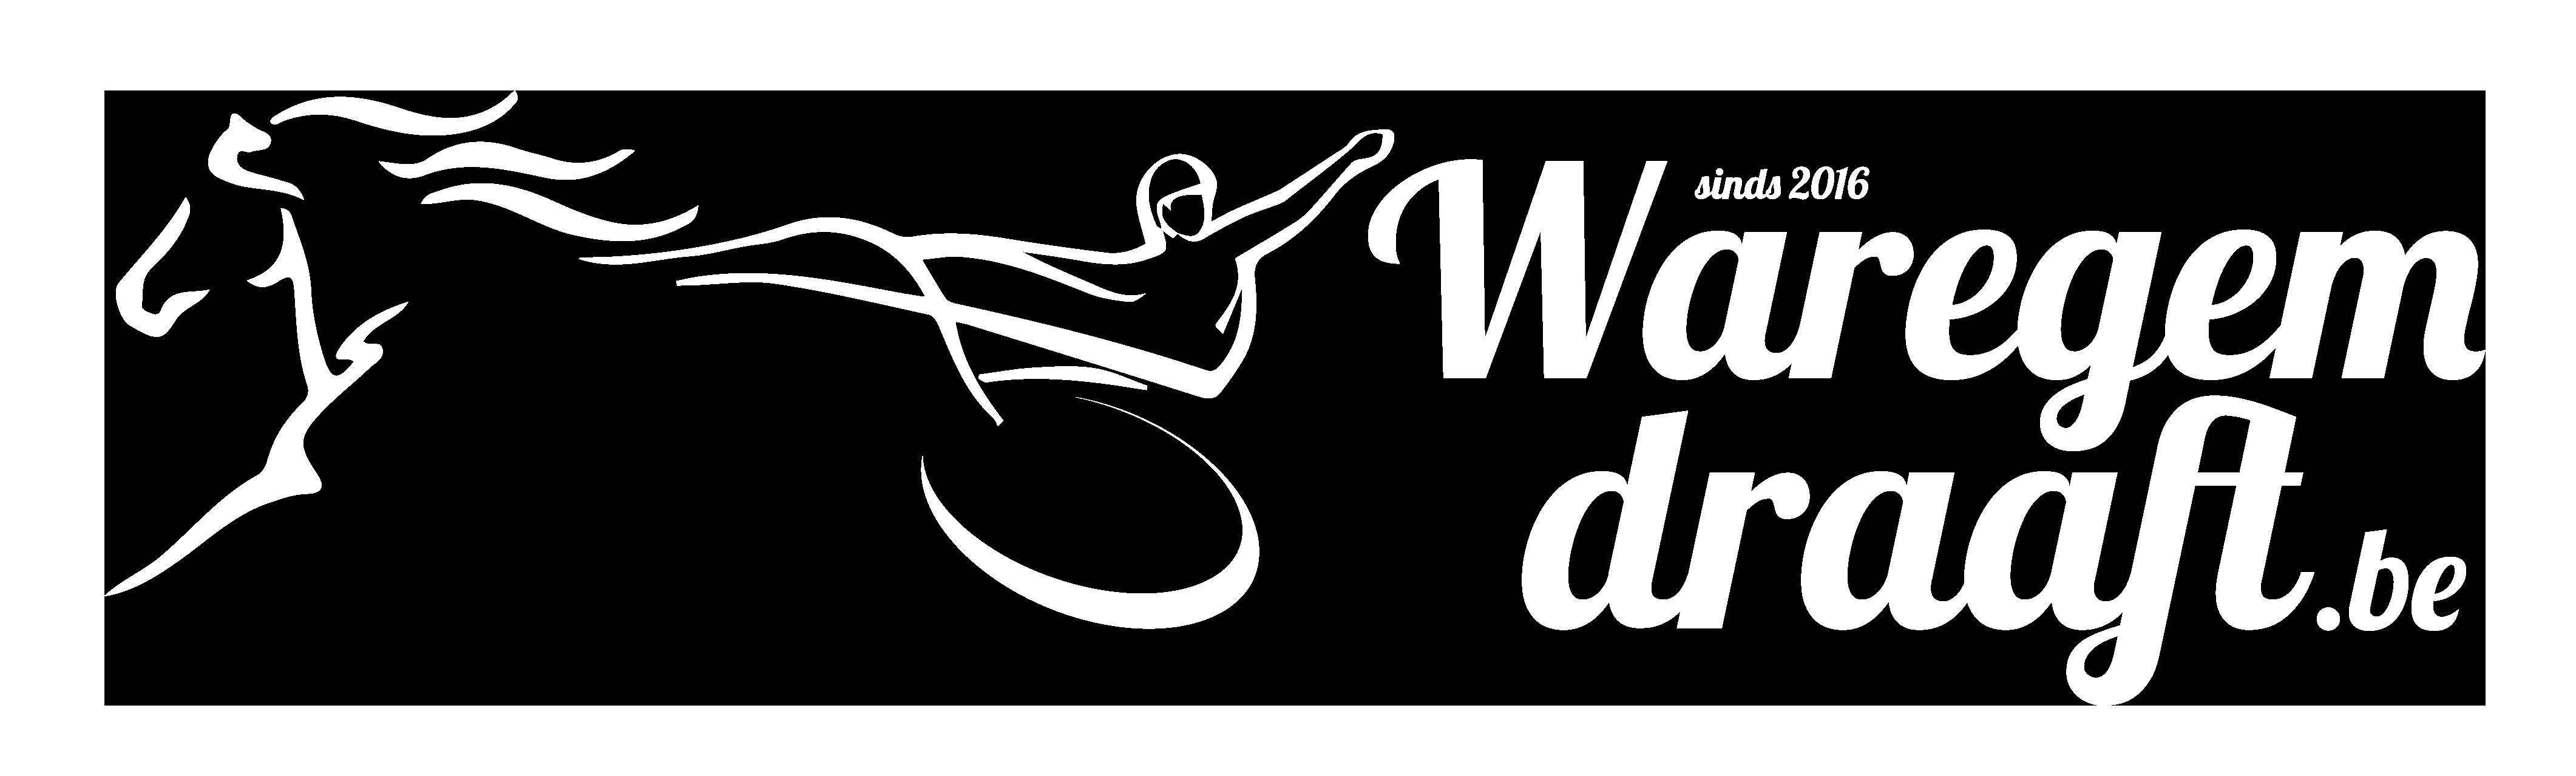 logo waregem draaft